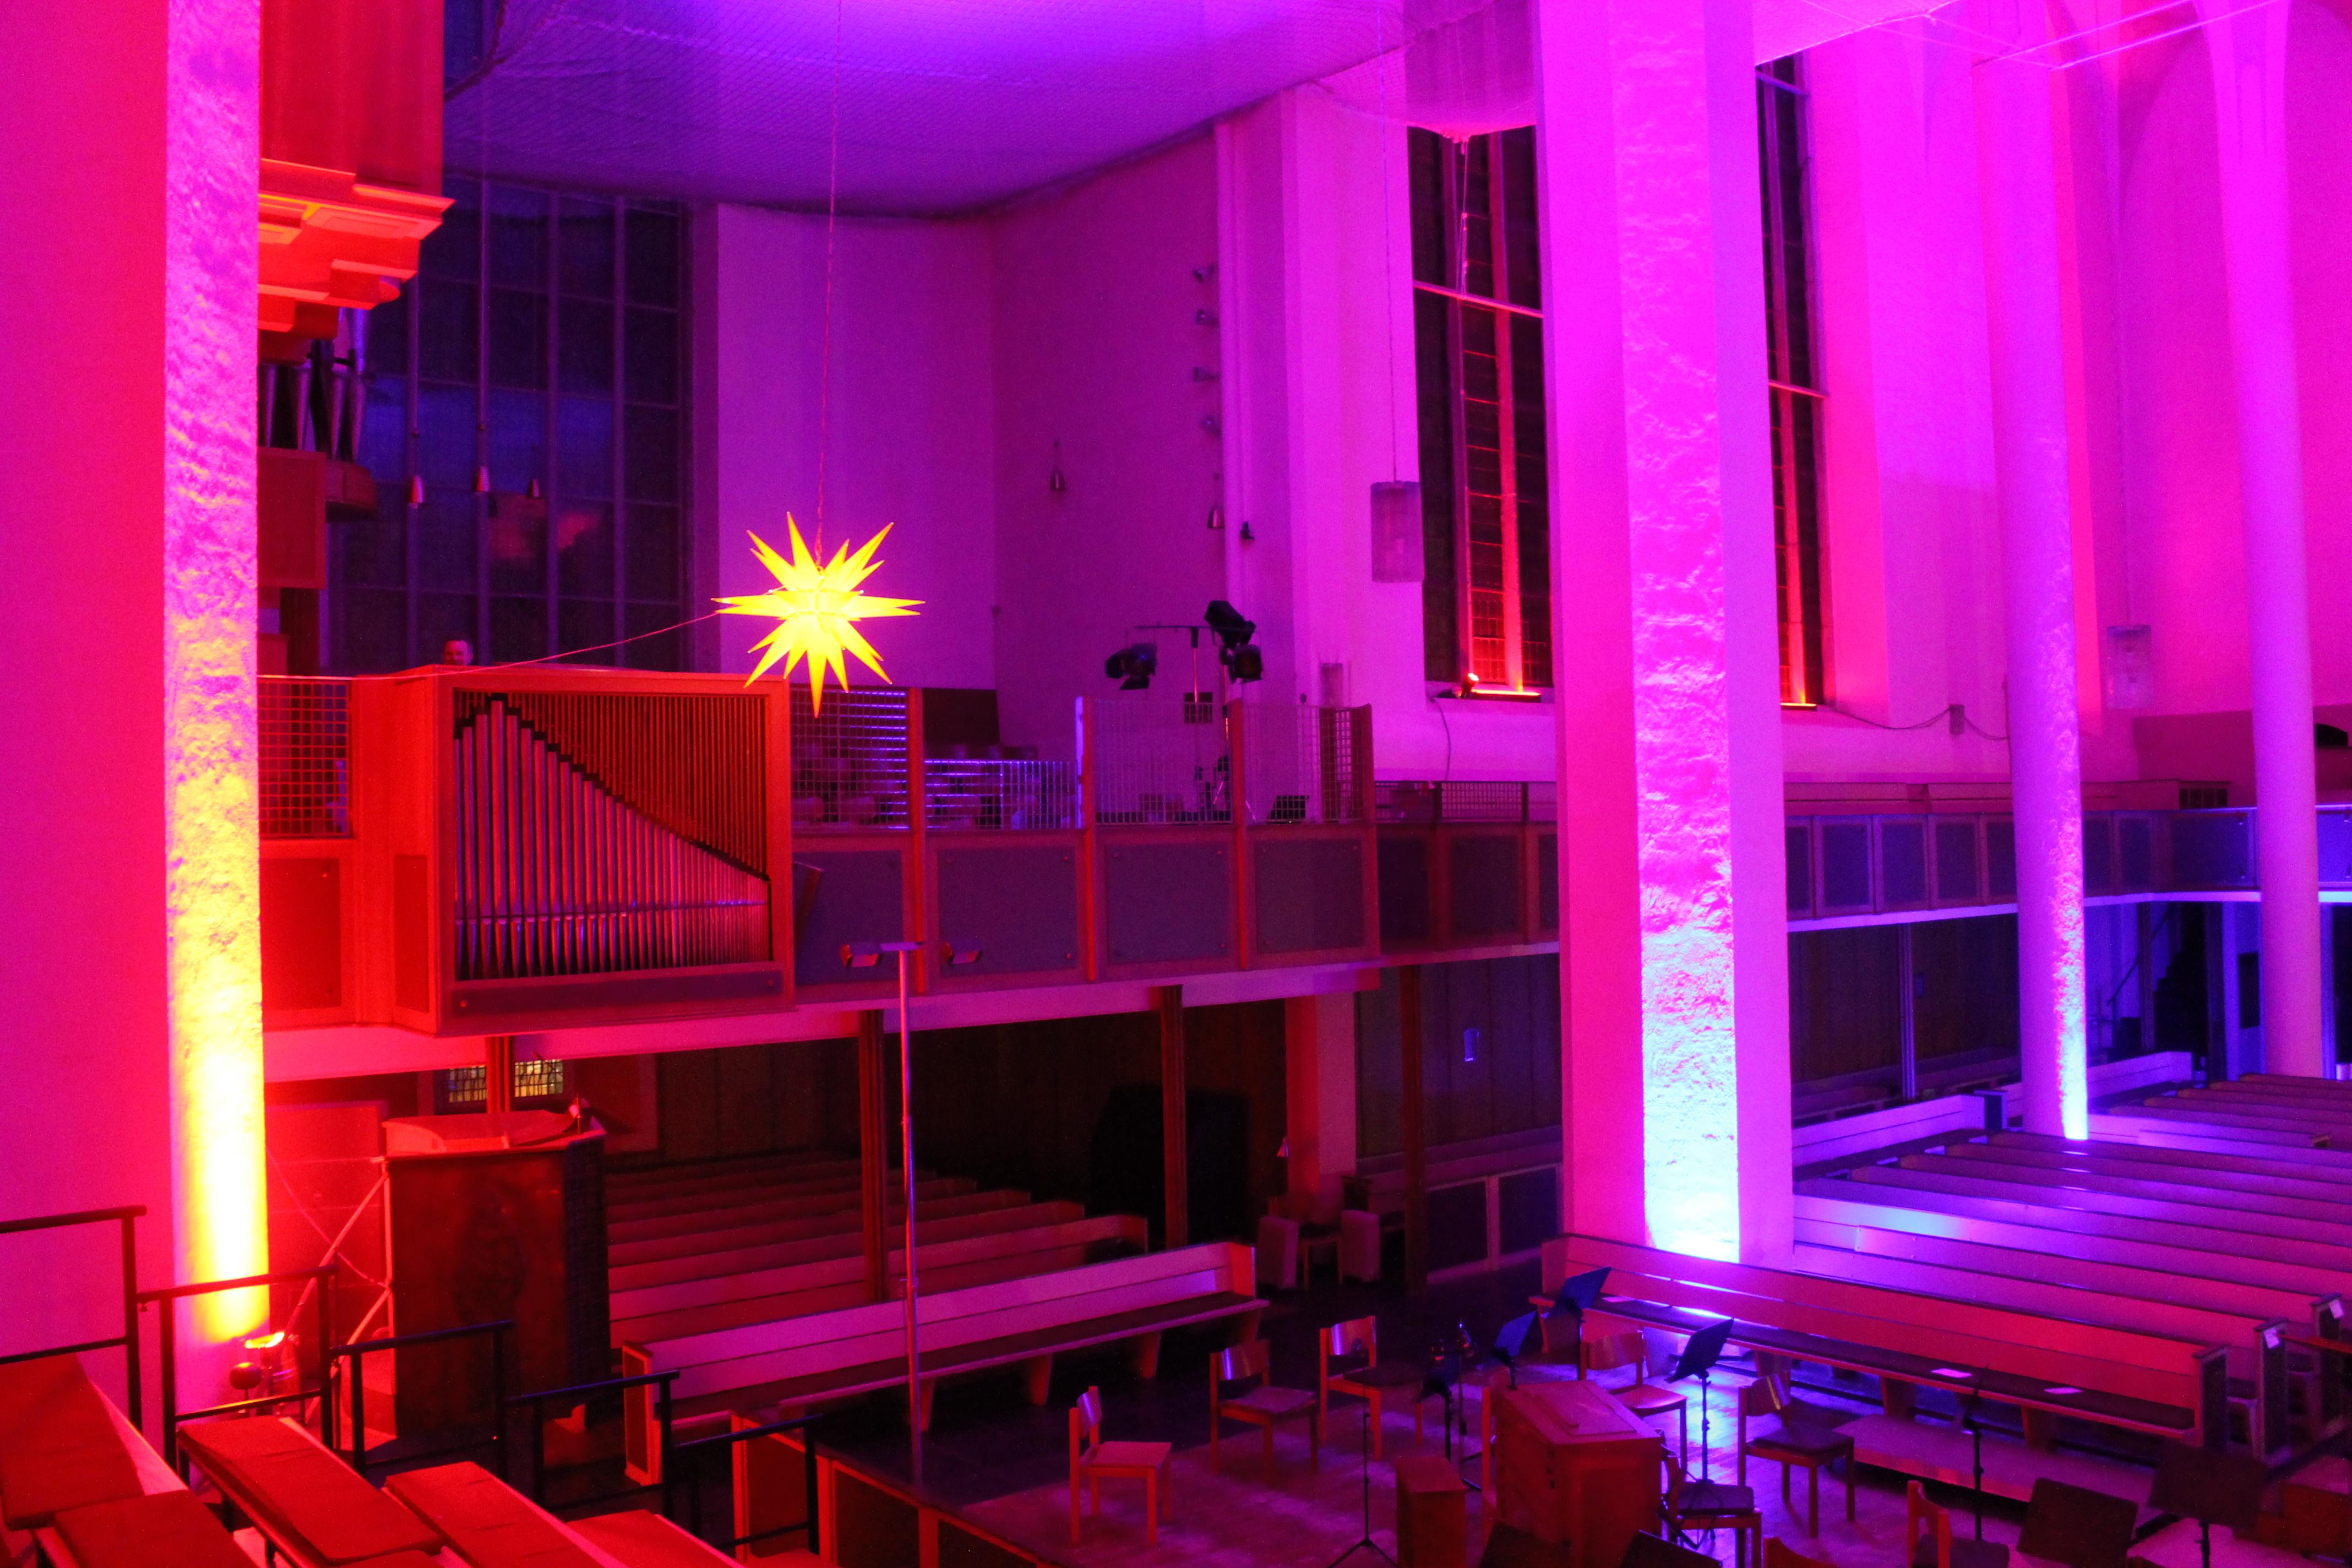 19-12-2018-Kirche_020